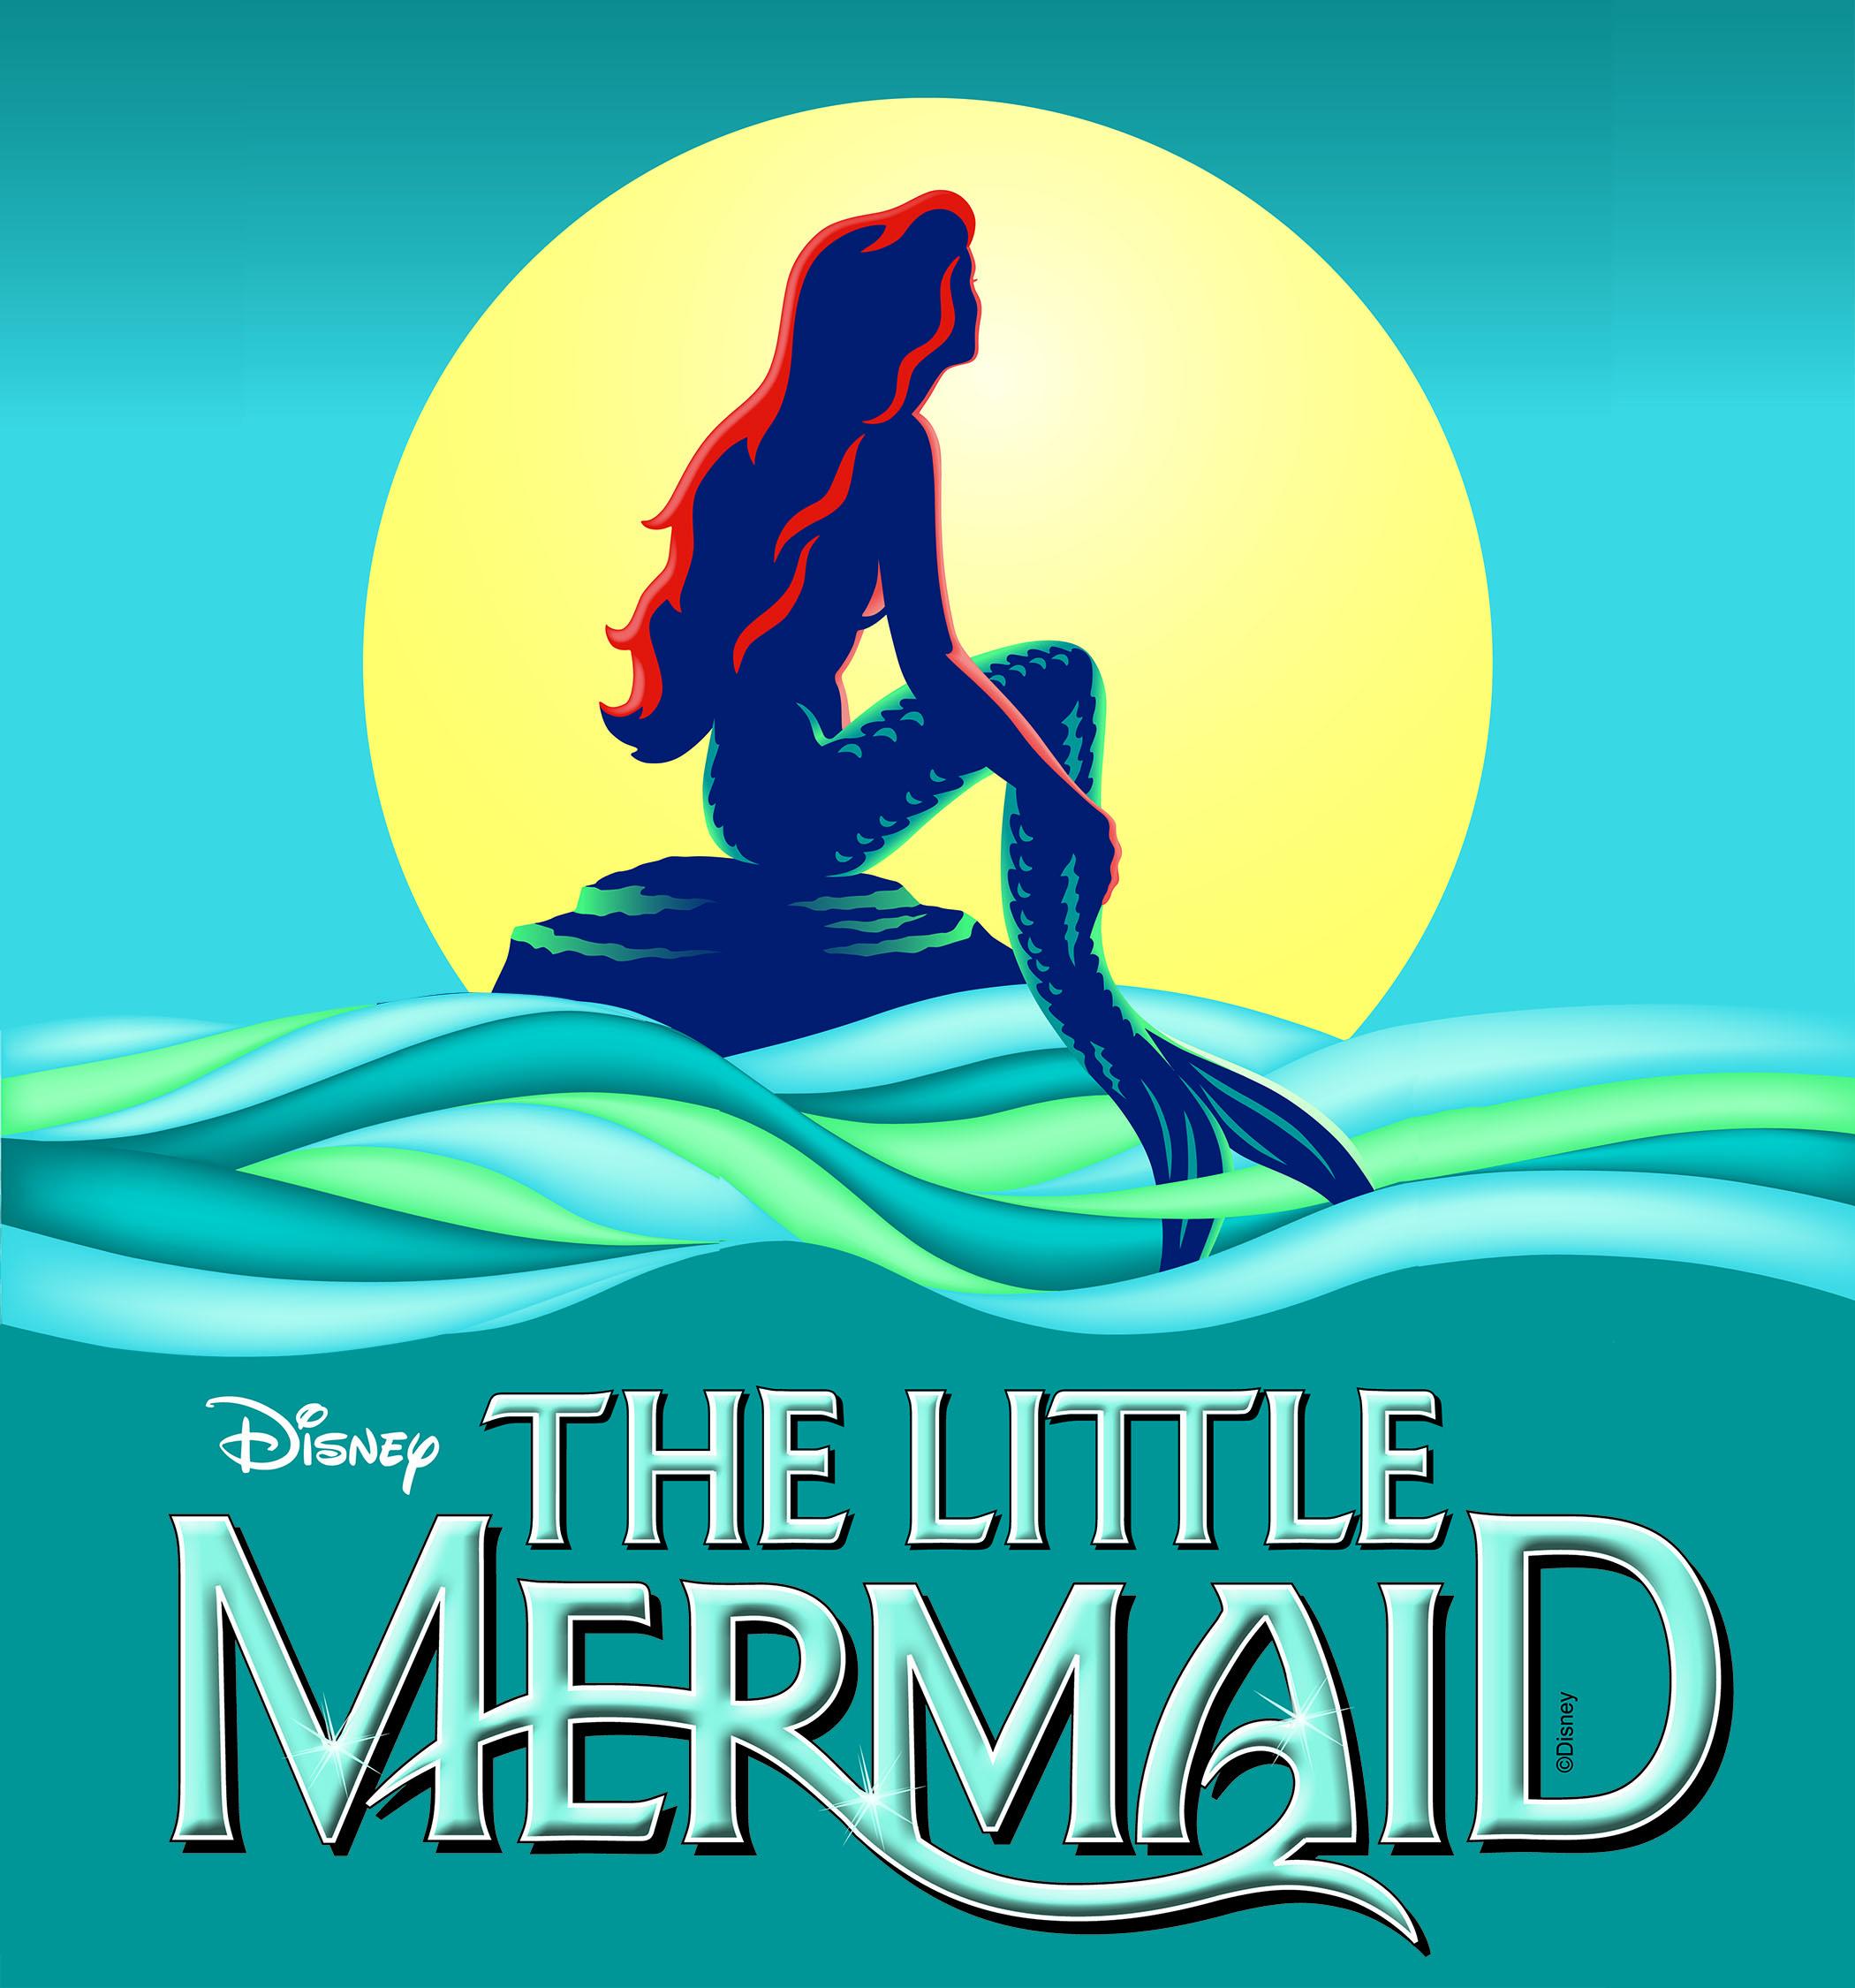 http://dancestudioma.com/script/app/web/upload/tinymce-source/The_Little_Mermaid%202020.jpg?1577583113306